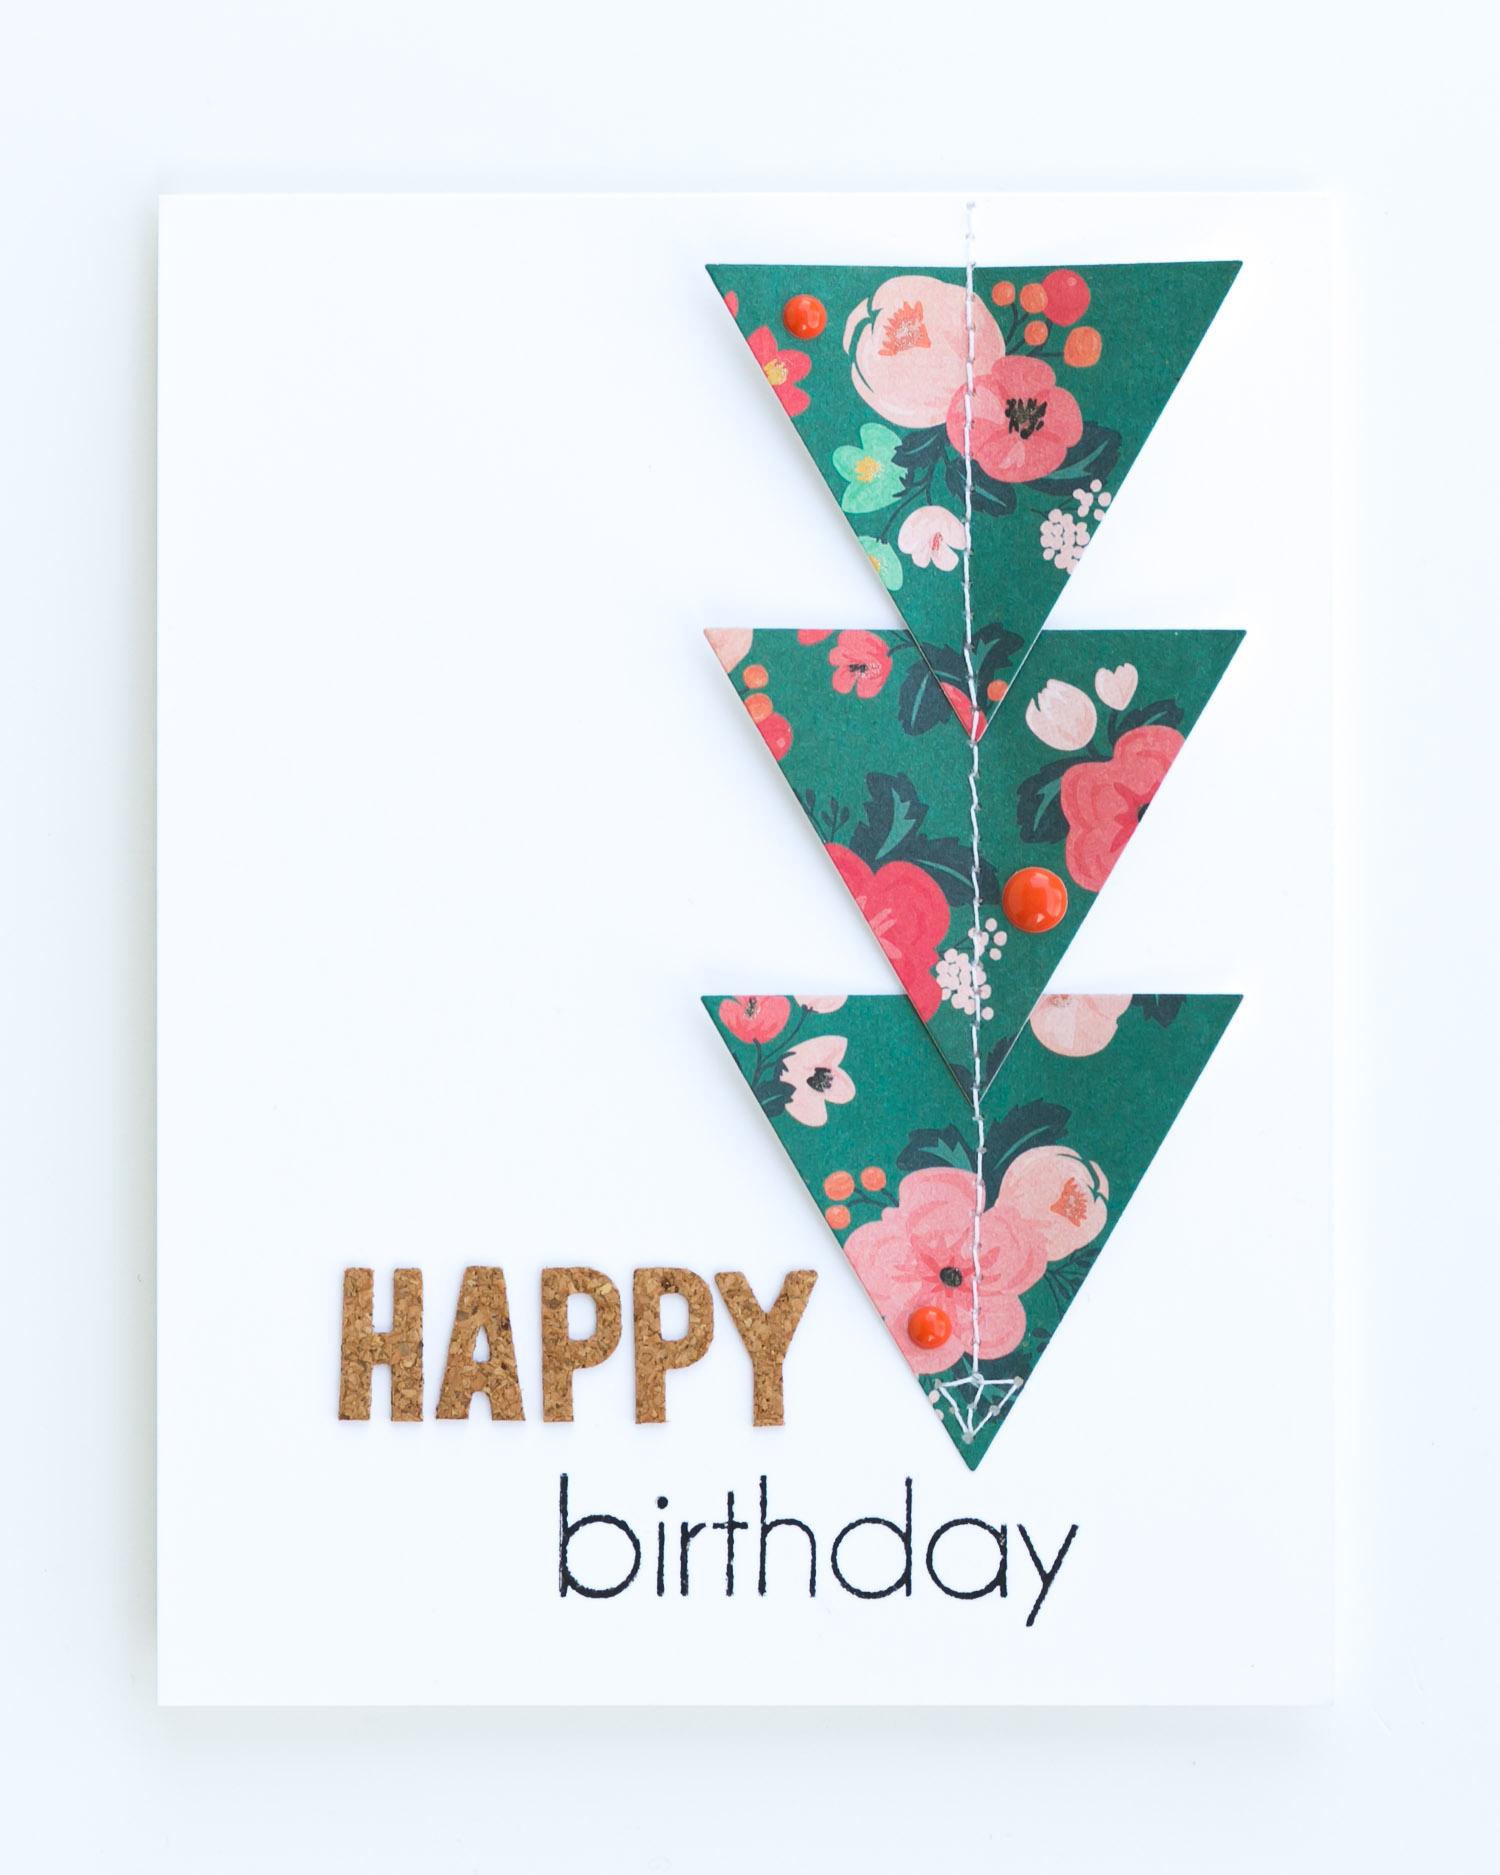 Triangle Birthday Card by @pixnglue